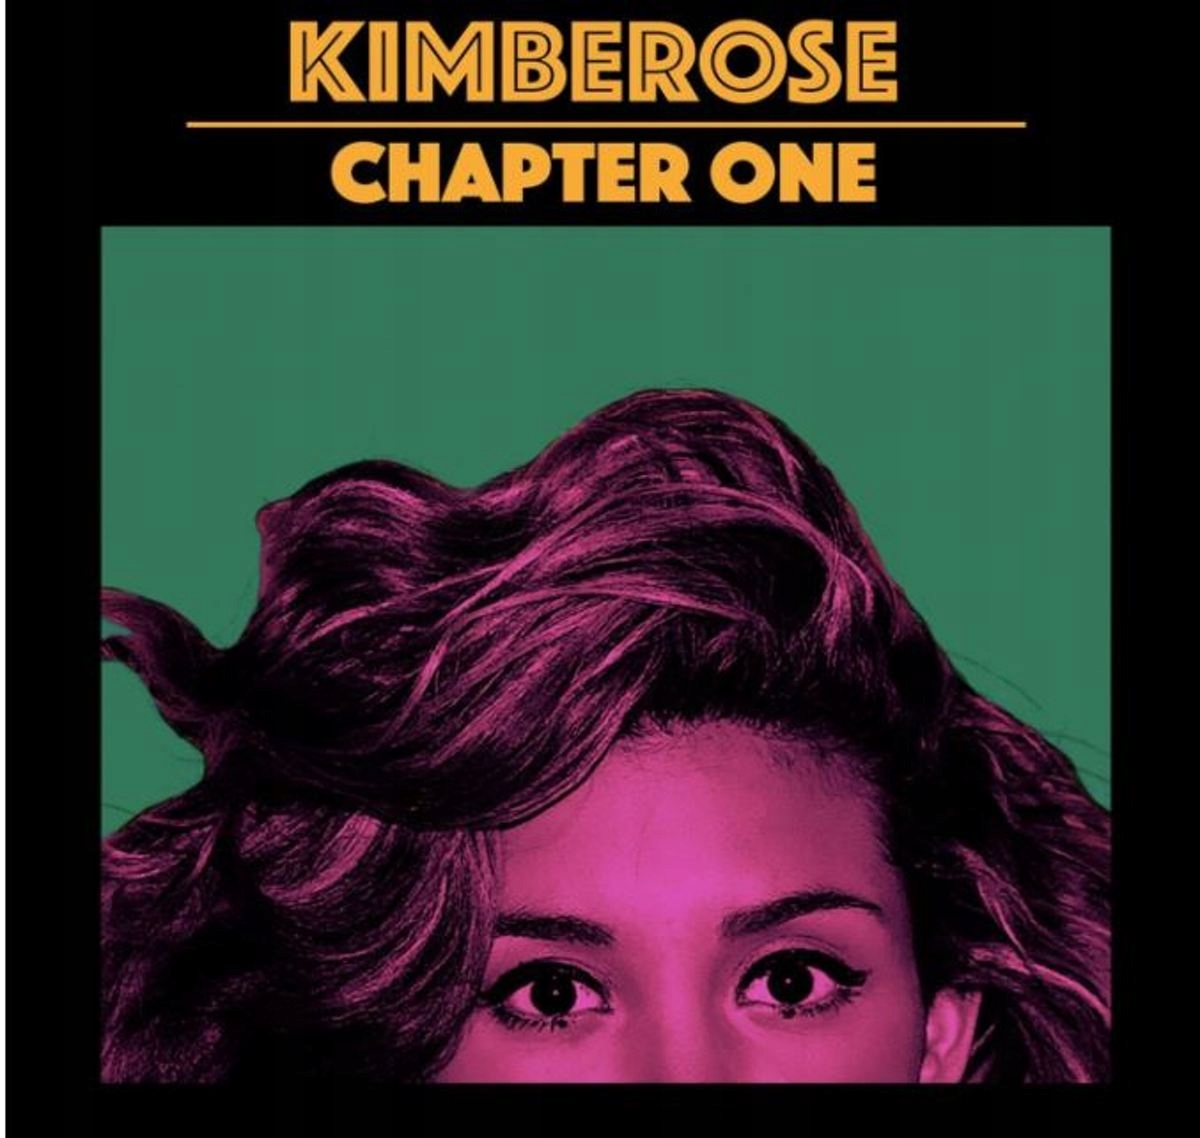 CD Kimberose - Chapter One